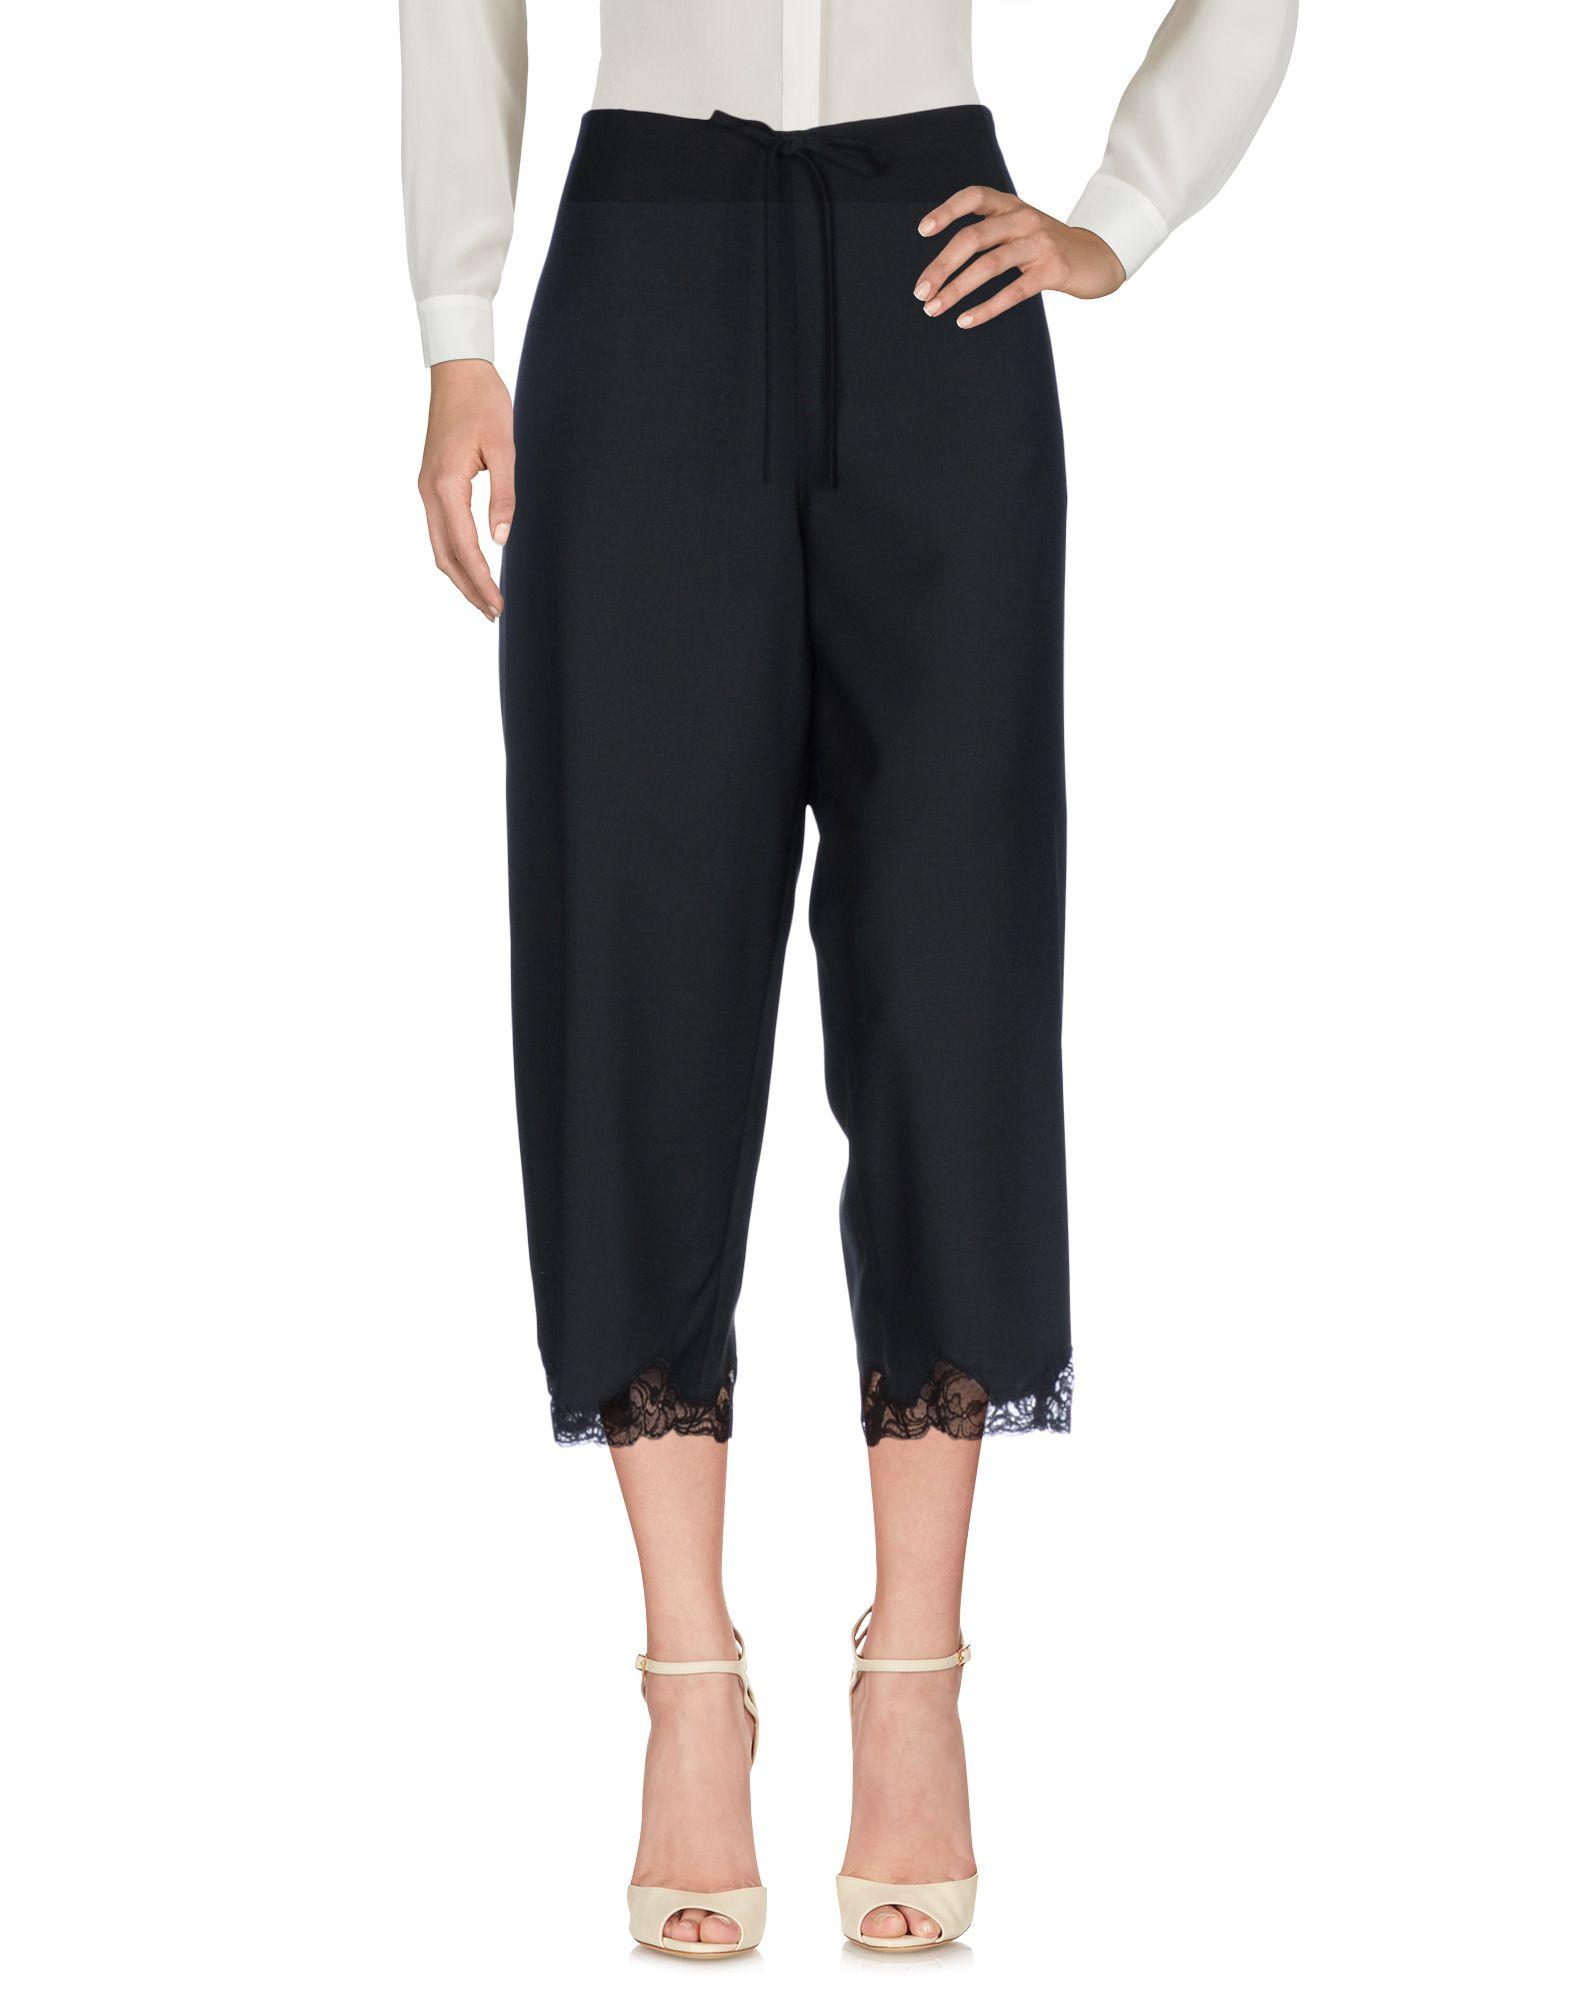 Pantalone Alexander Wang Donna - Acquista online su FB399jVoK